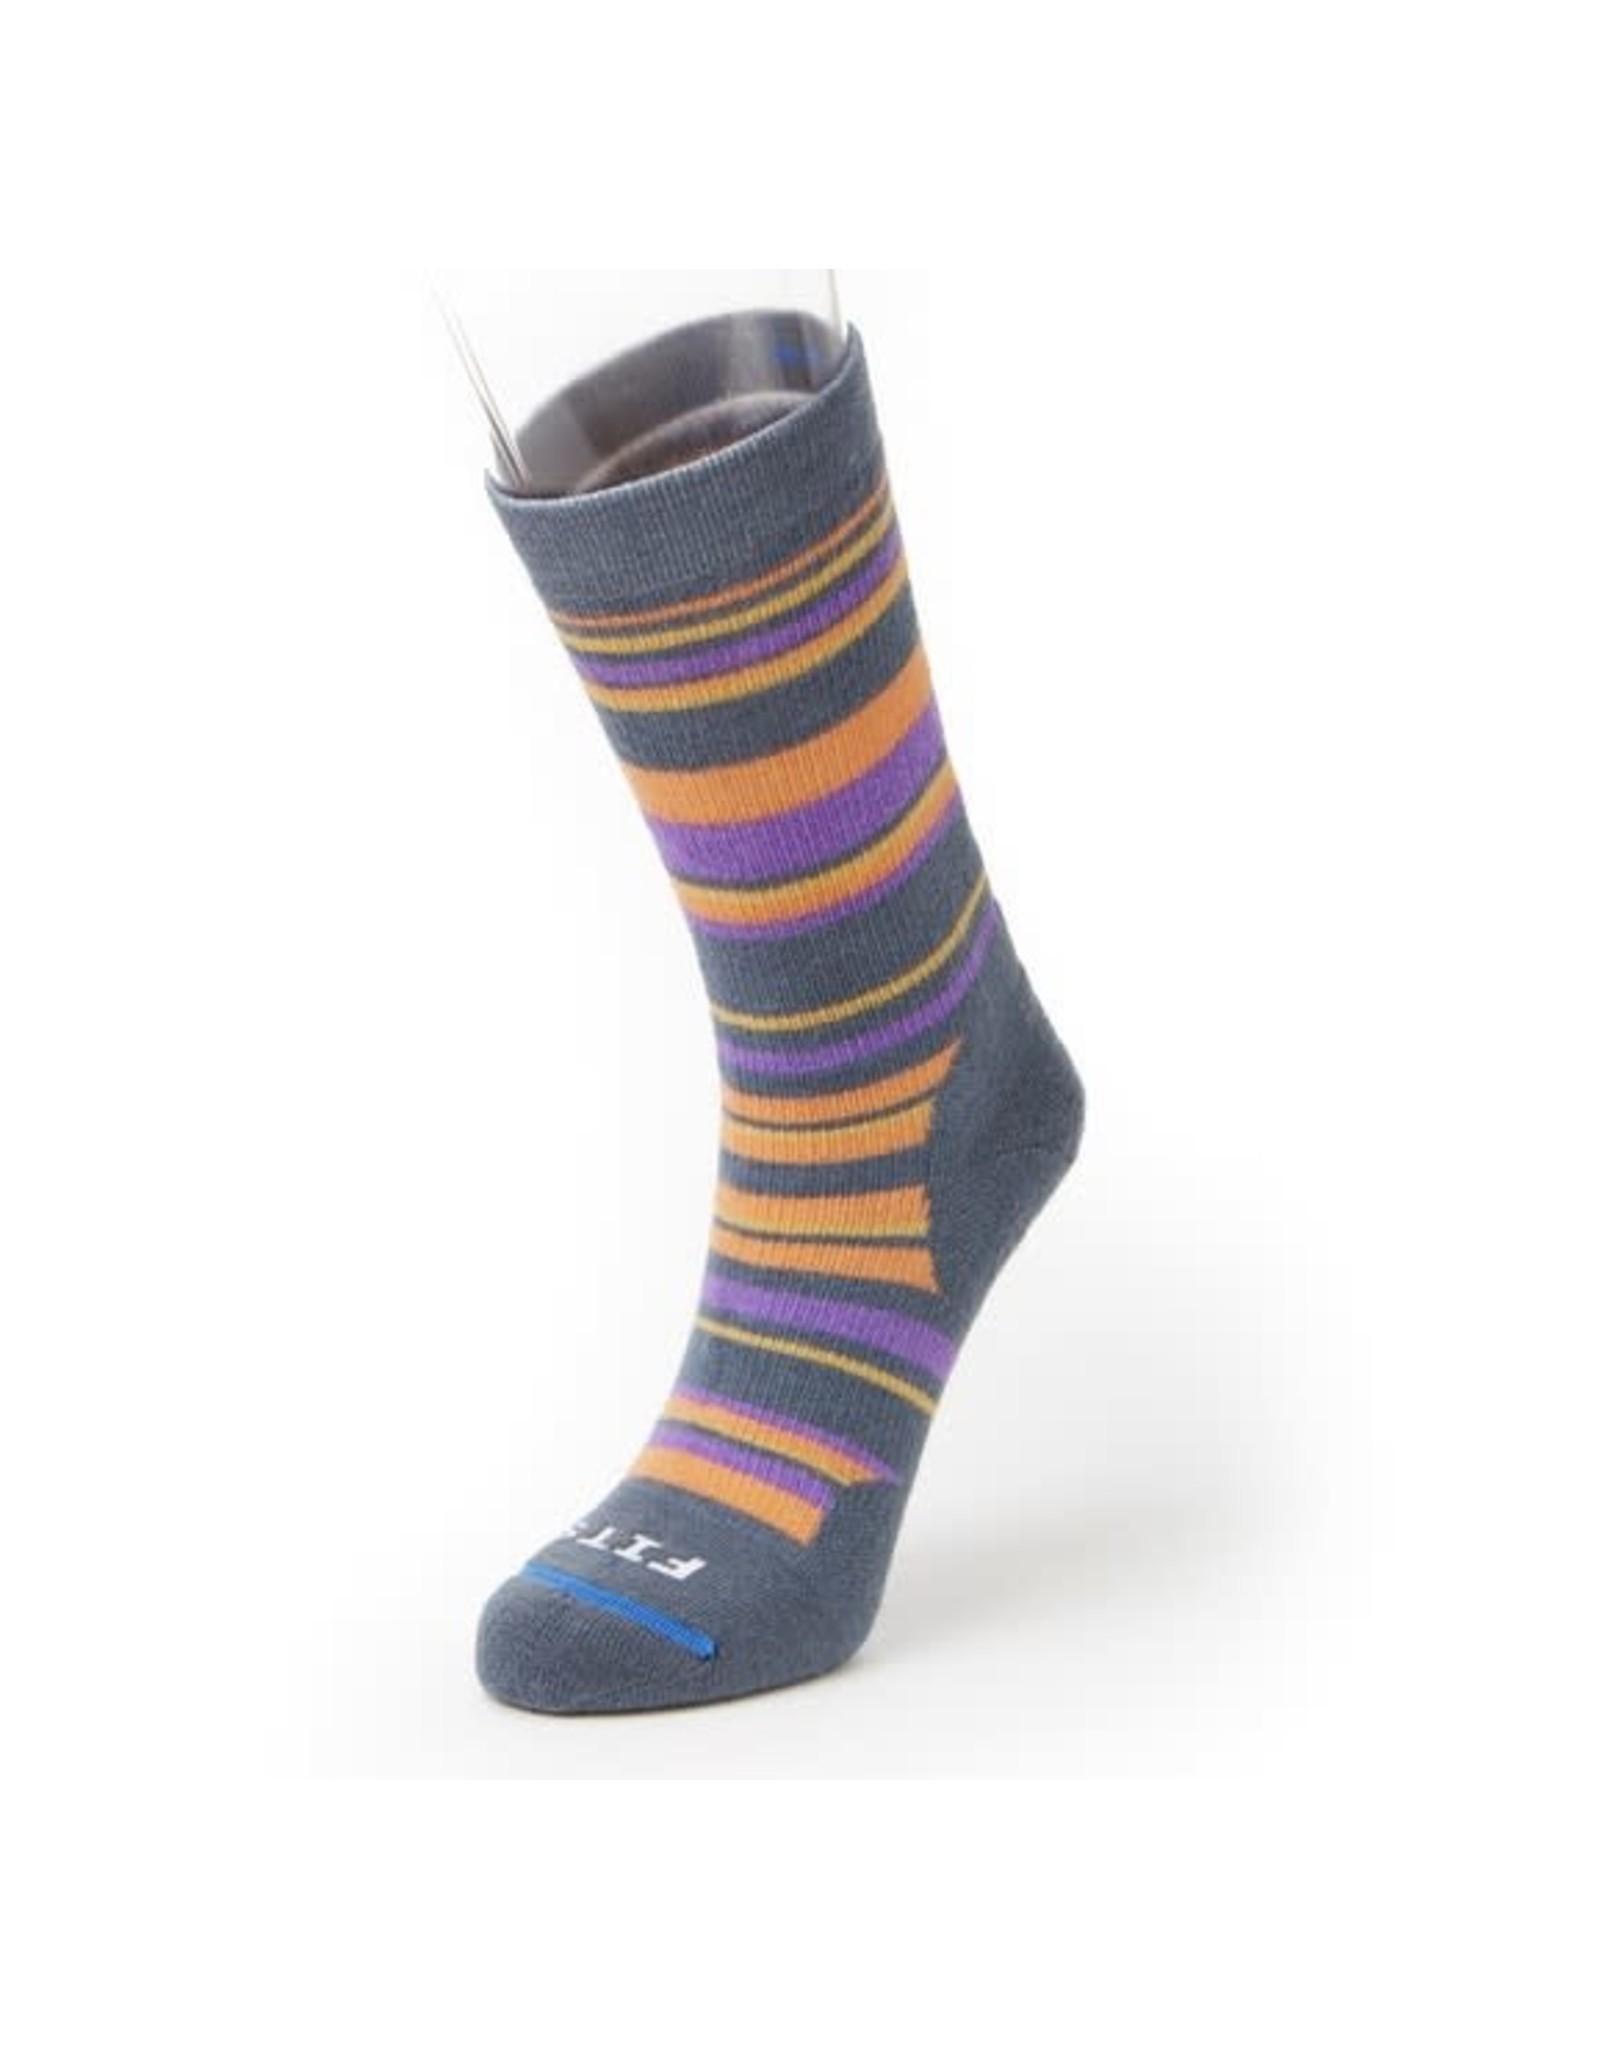 FITS Socks Medium Hiker Crew